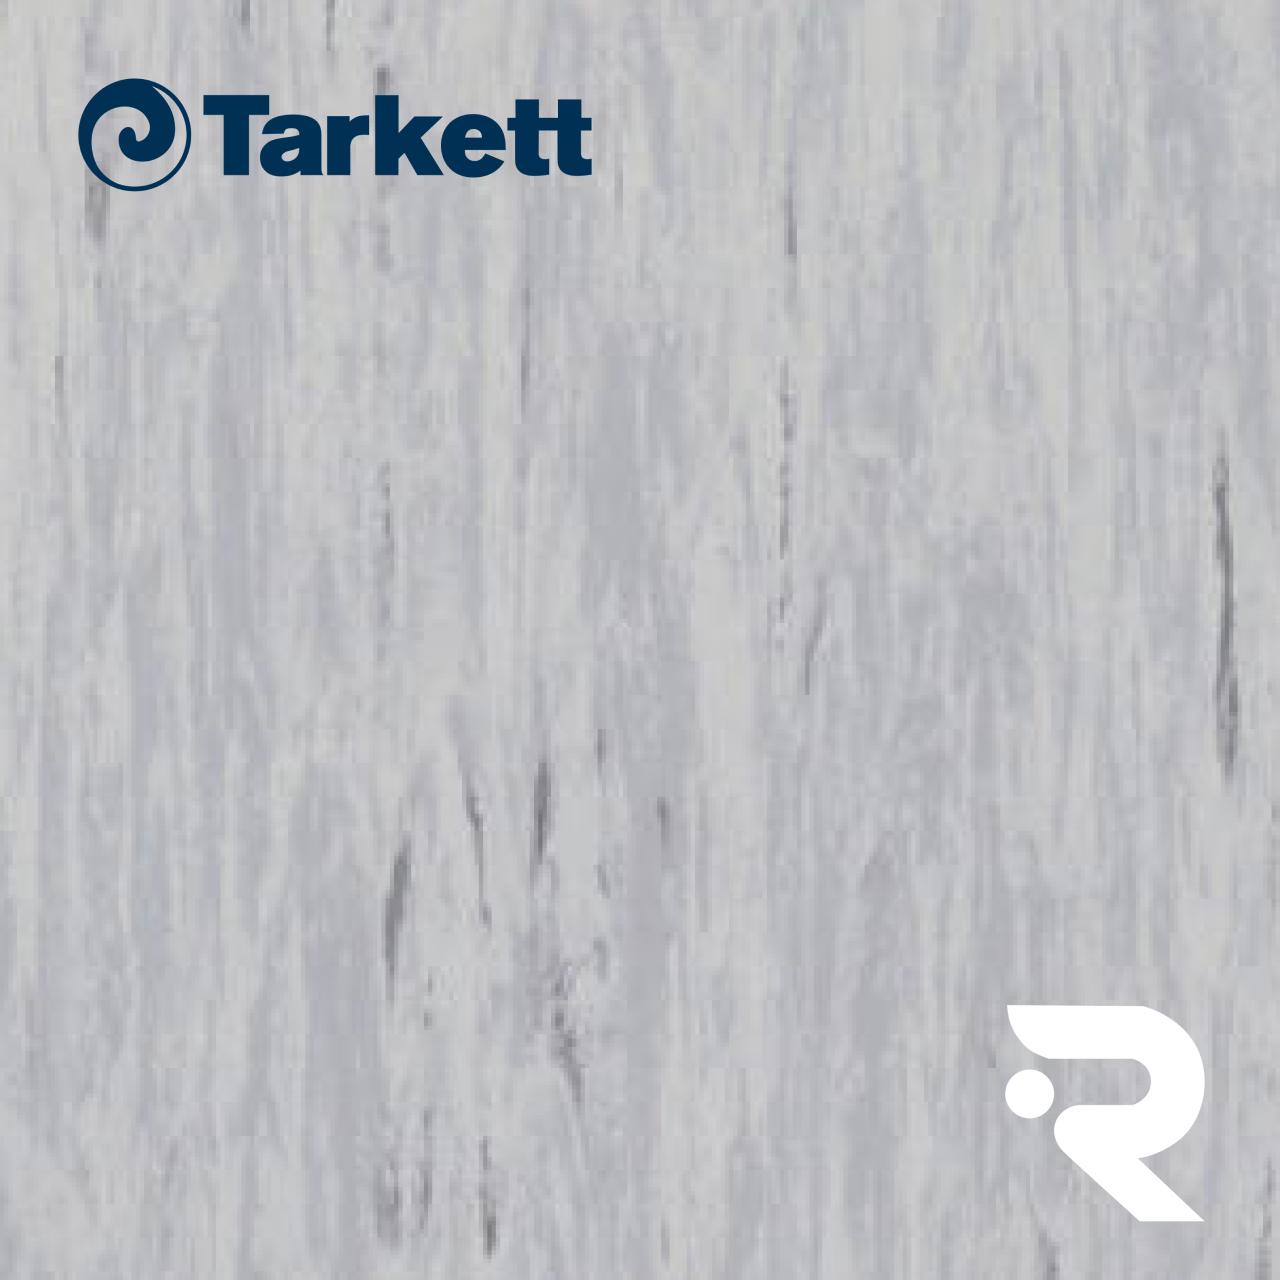 🏫 Гомогенный линолеум Tarkett | Standard LIGHT BEIGE GREY 0494 | Standard Plus 2.0 mm | 2 х 23 м